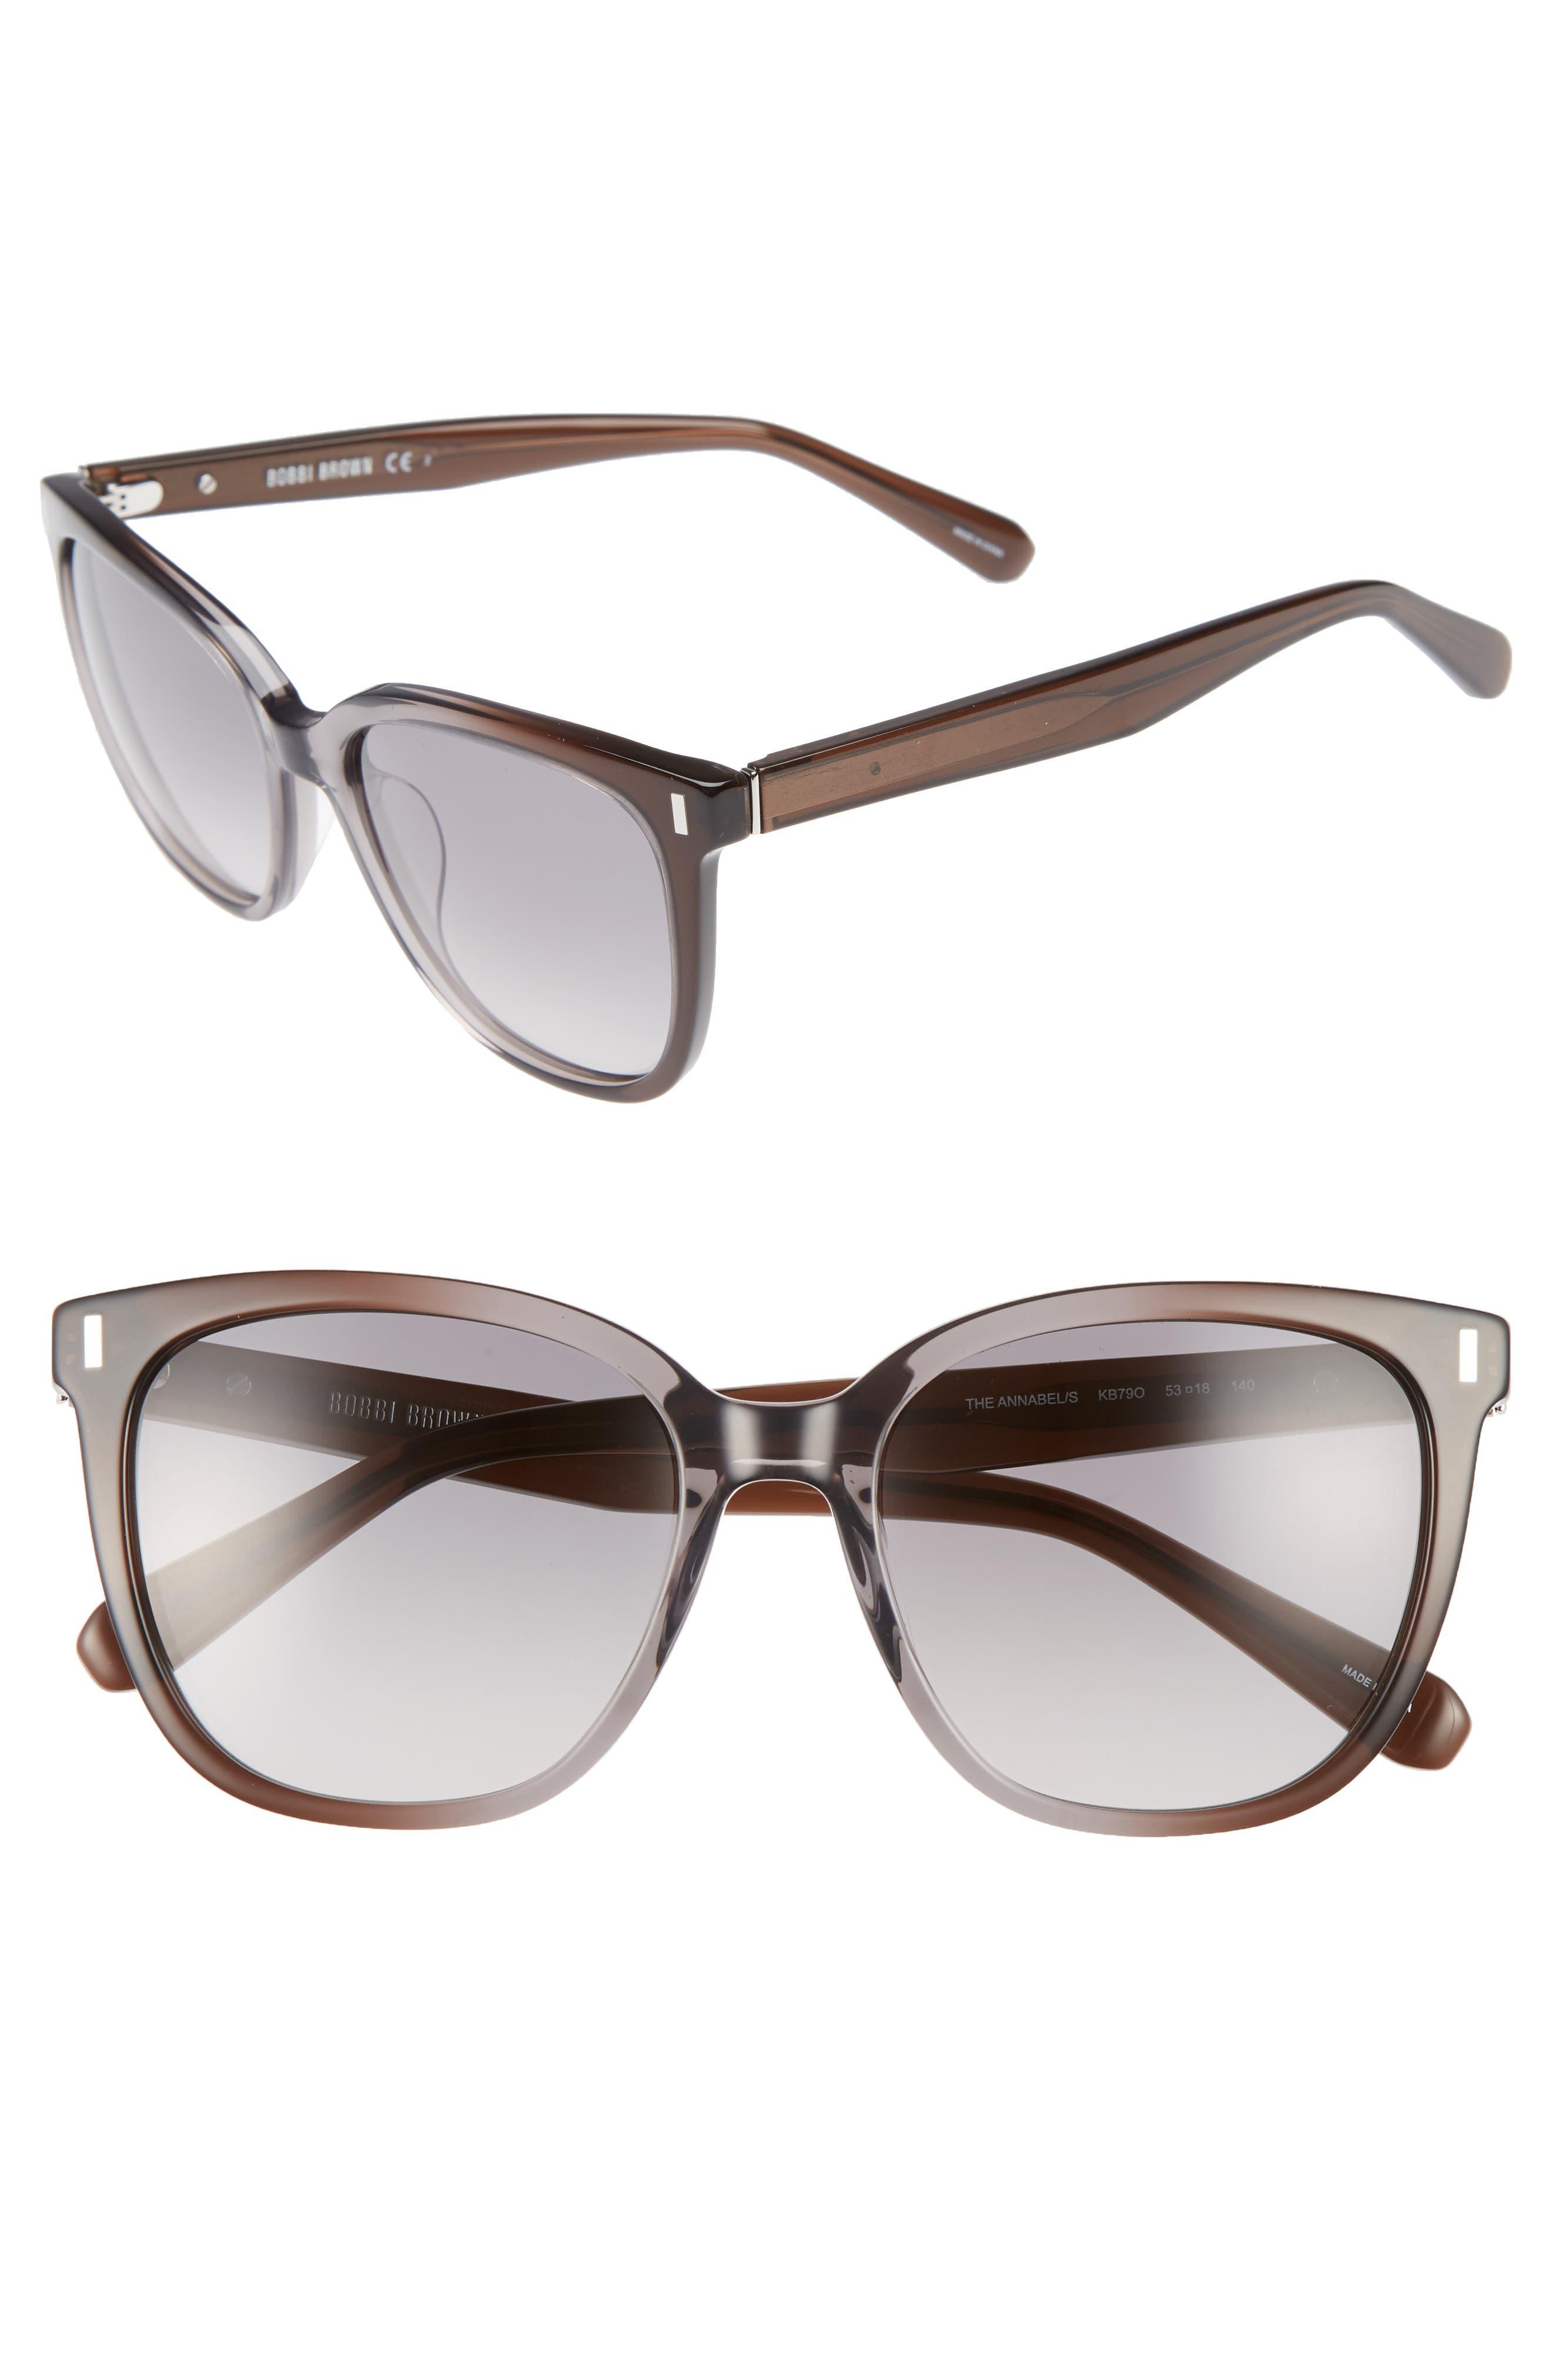 Bobbi Brown The Annabel 53mm Cat Eye Sunglasses